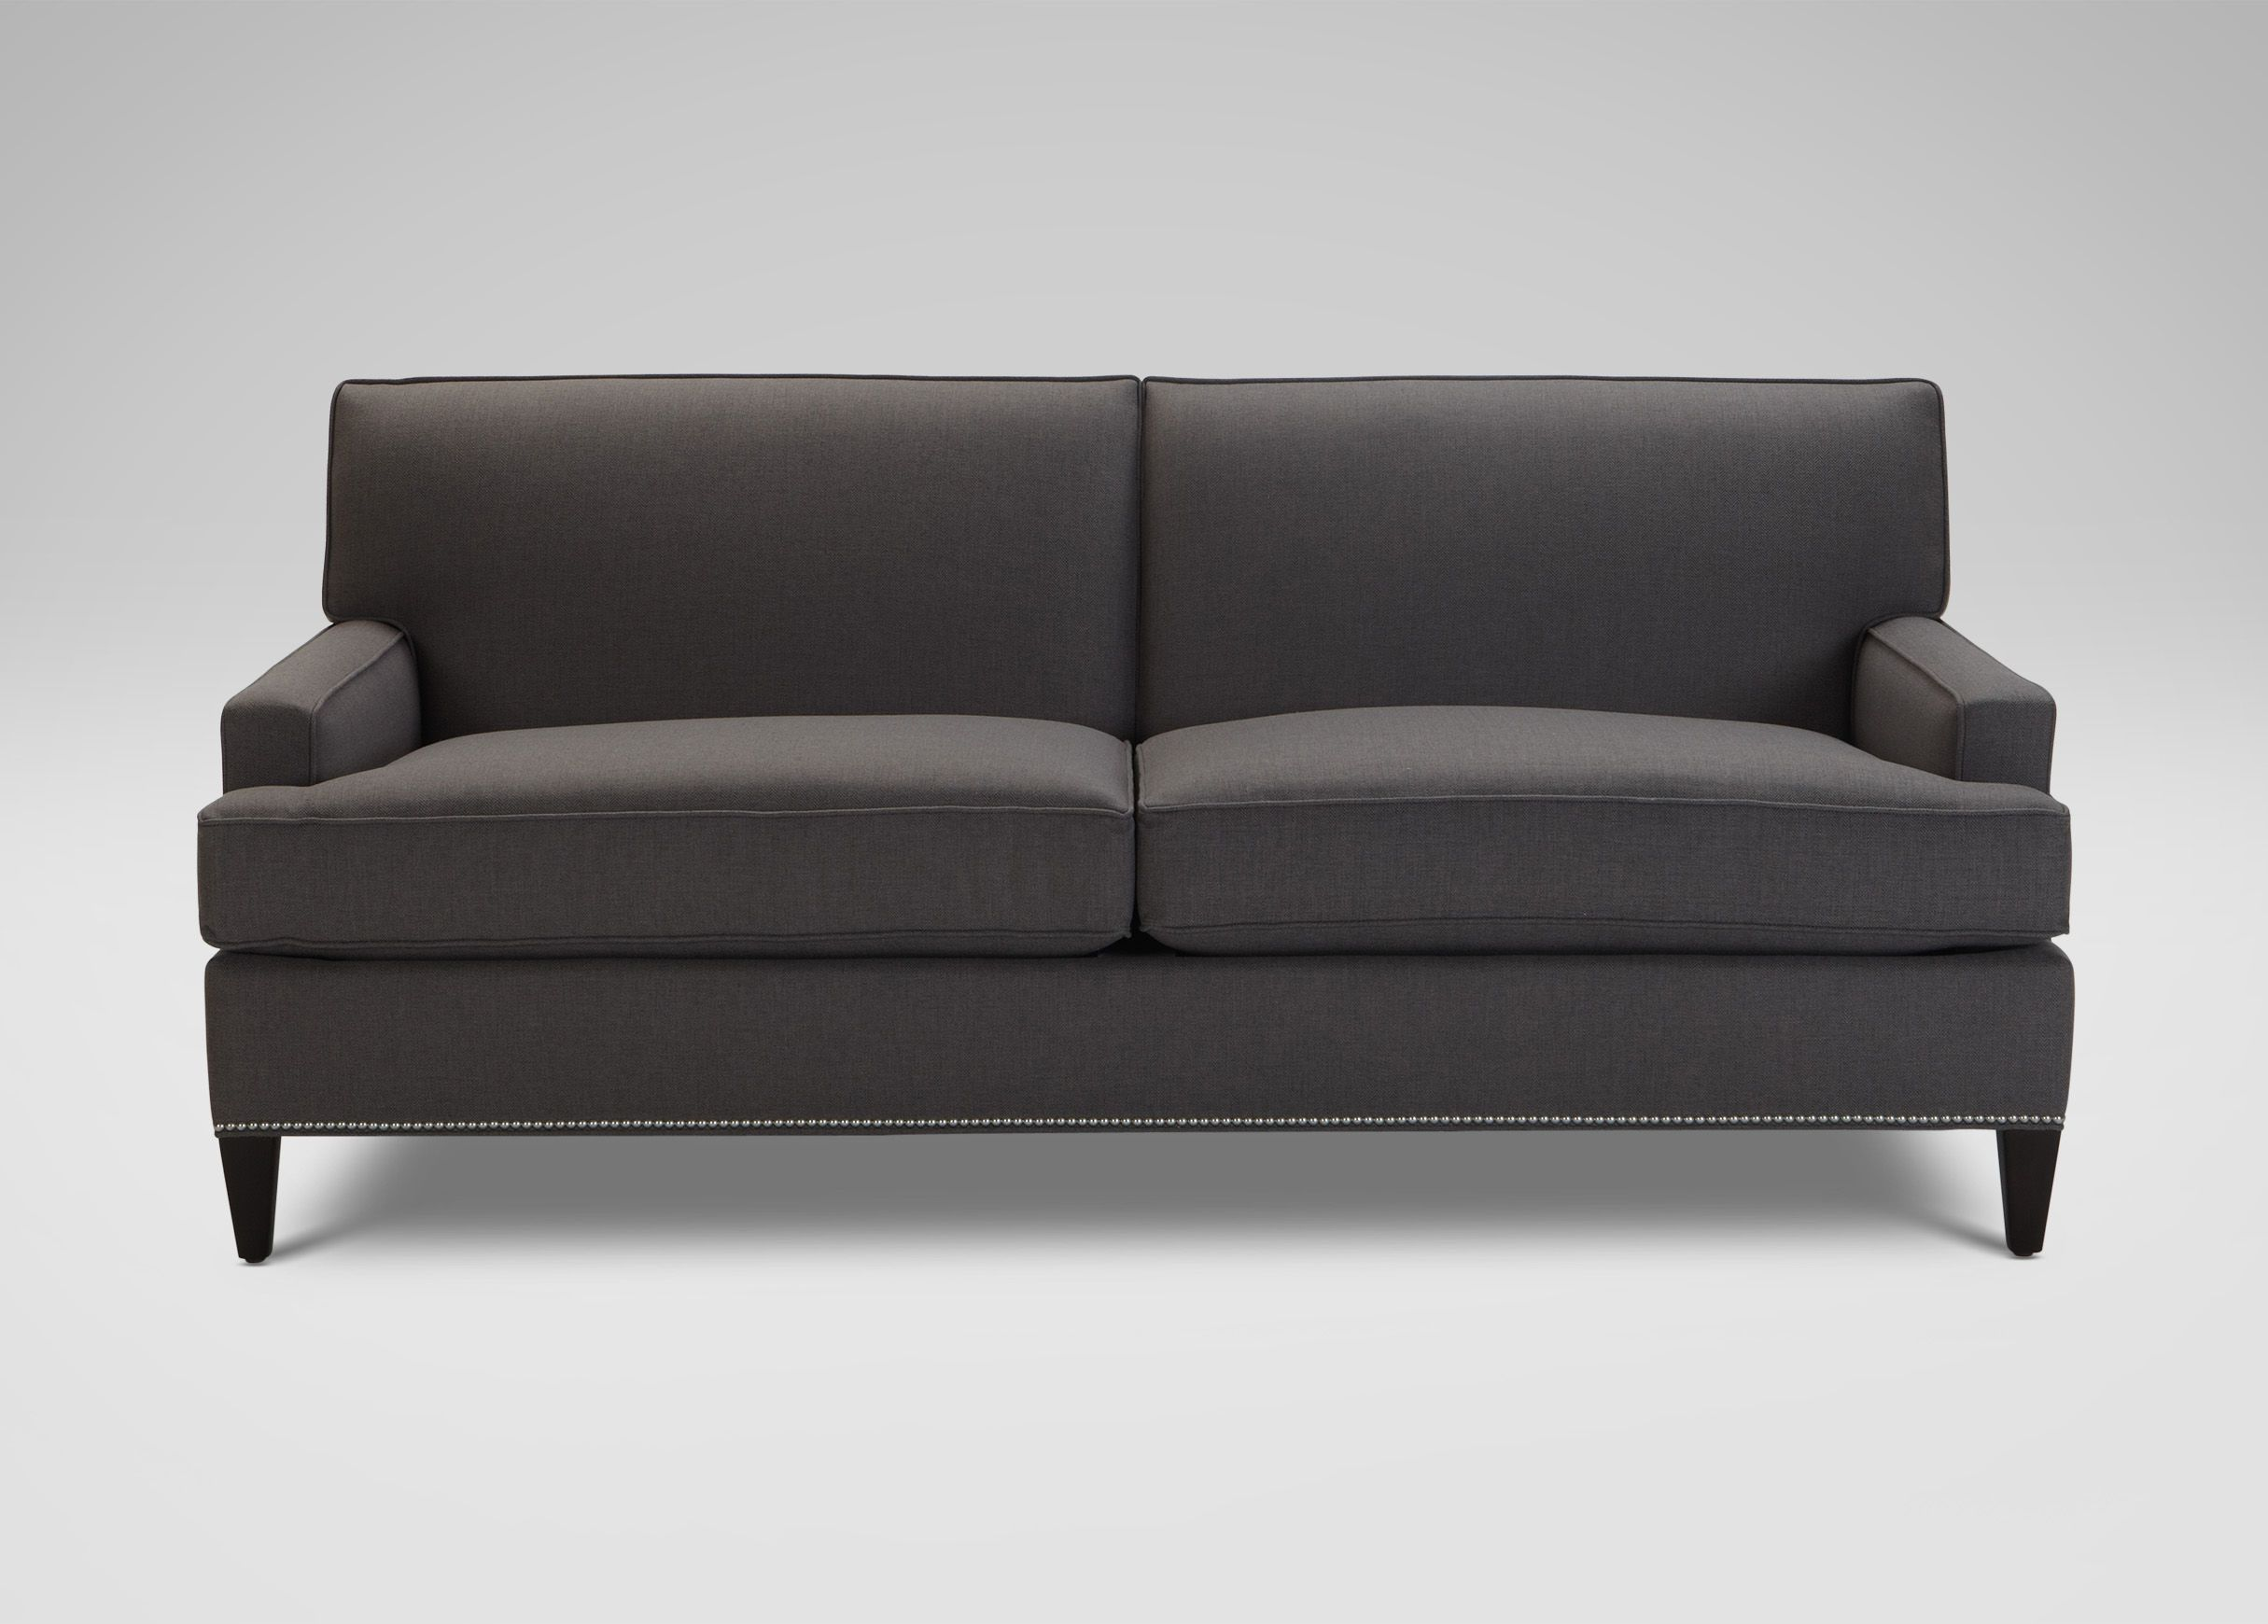 Pewter Sofa Bed Florida Corner Reviews Bryant Mack Ethan Allen Home Living Room